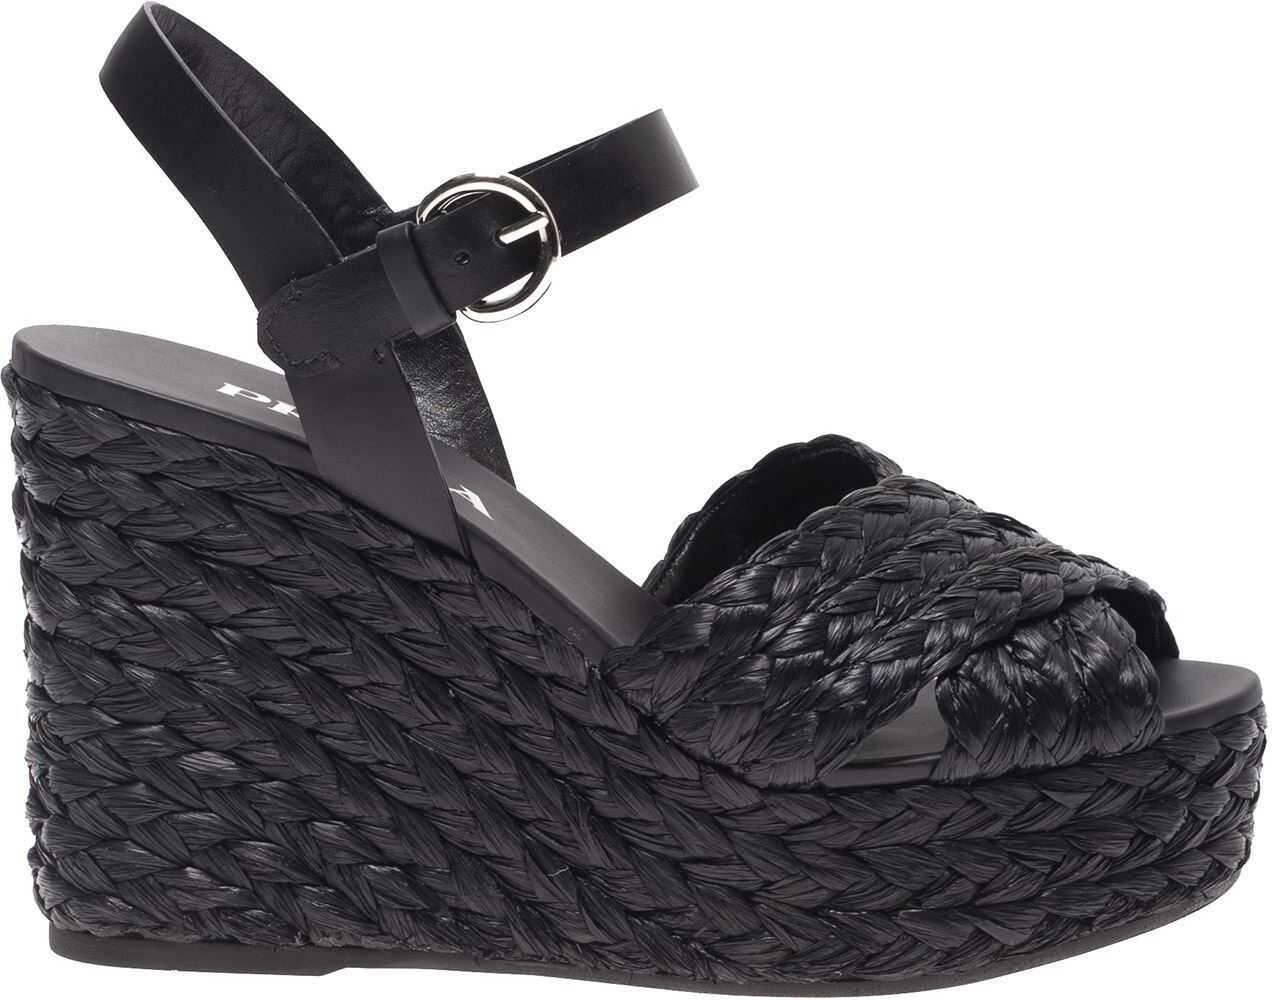 Prada Raffia Wedge Sandals In Black Black